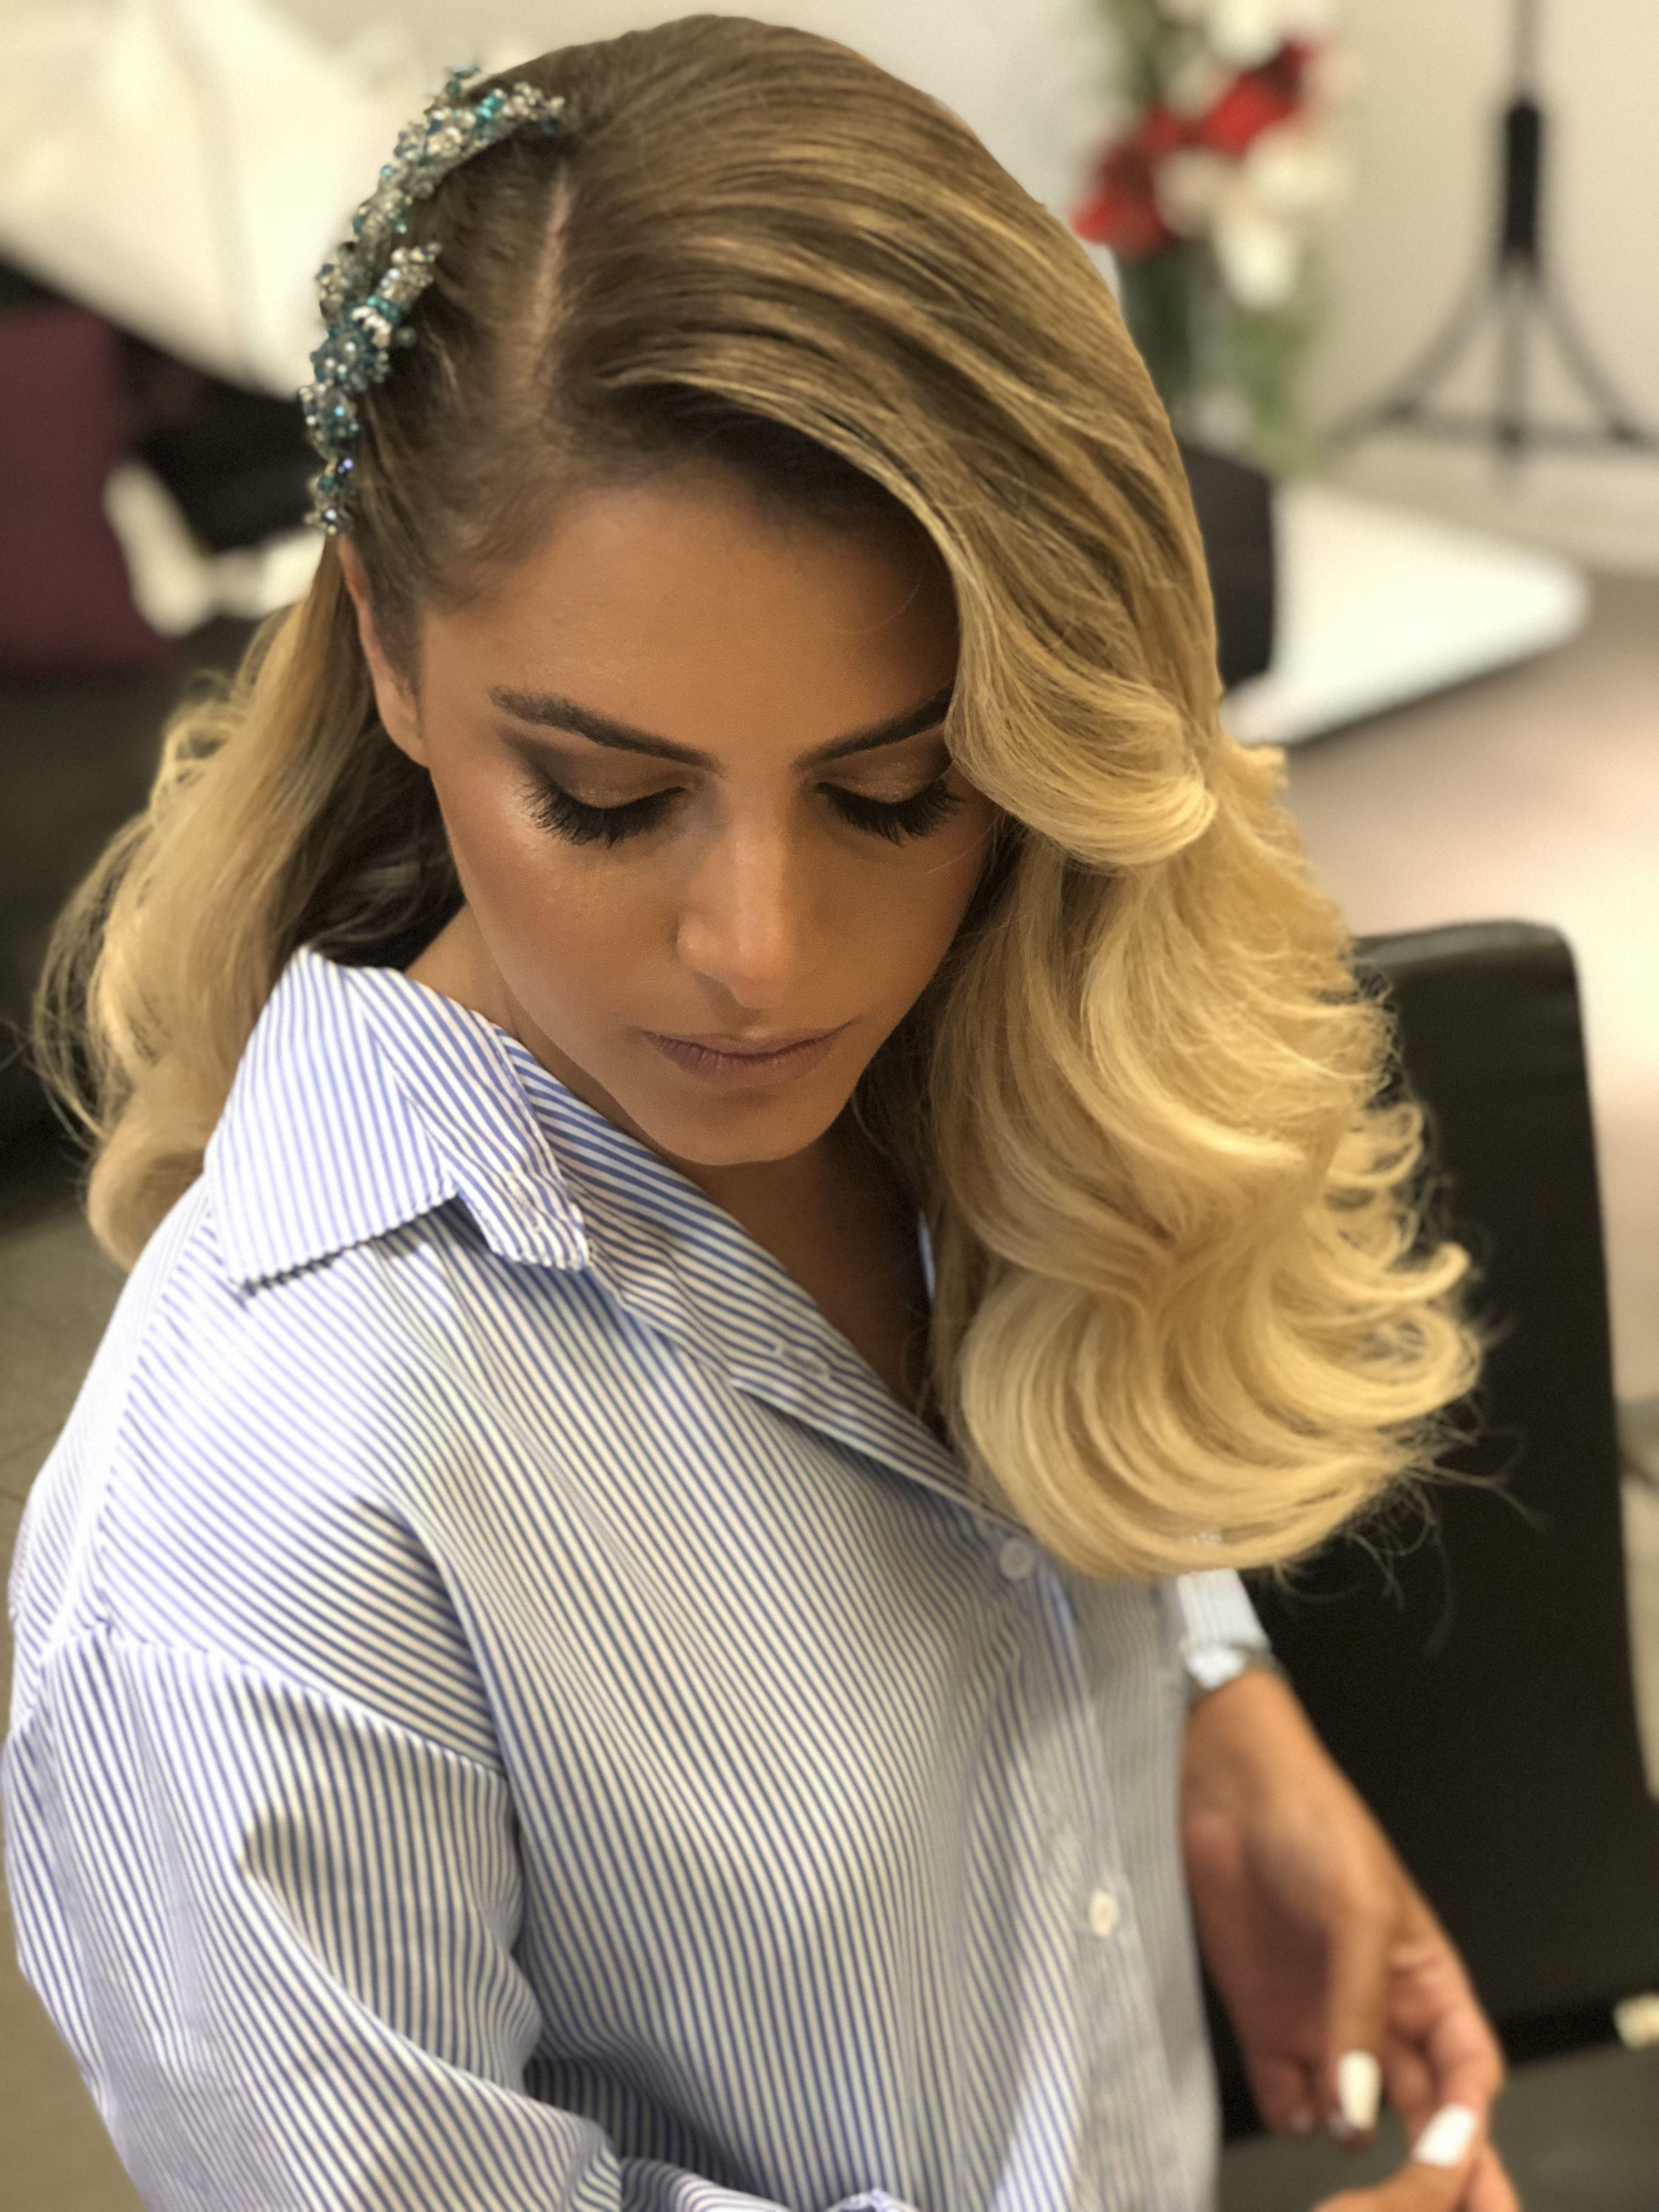 Lebanon Hair Hairstyle Haircut Hairfashion Haircolor Shorthair Ombrehair Beauty Supernatural Party Lo Best Hair Salon Hair Styles Short Hair Styles